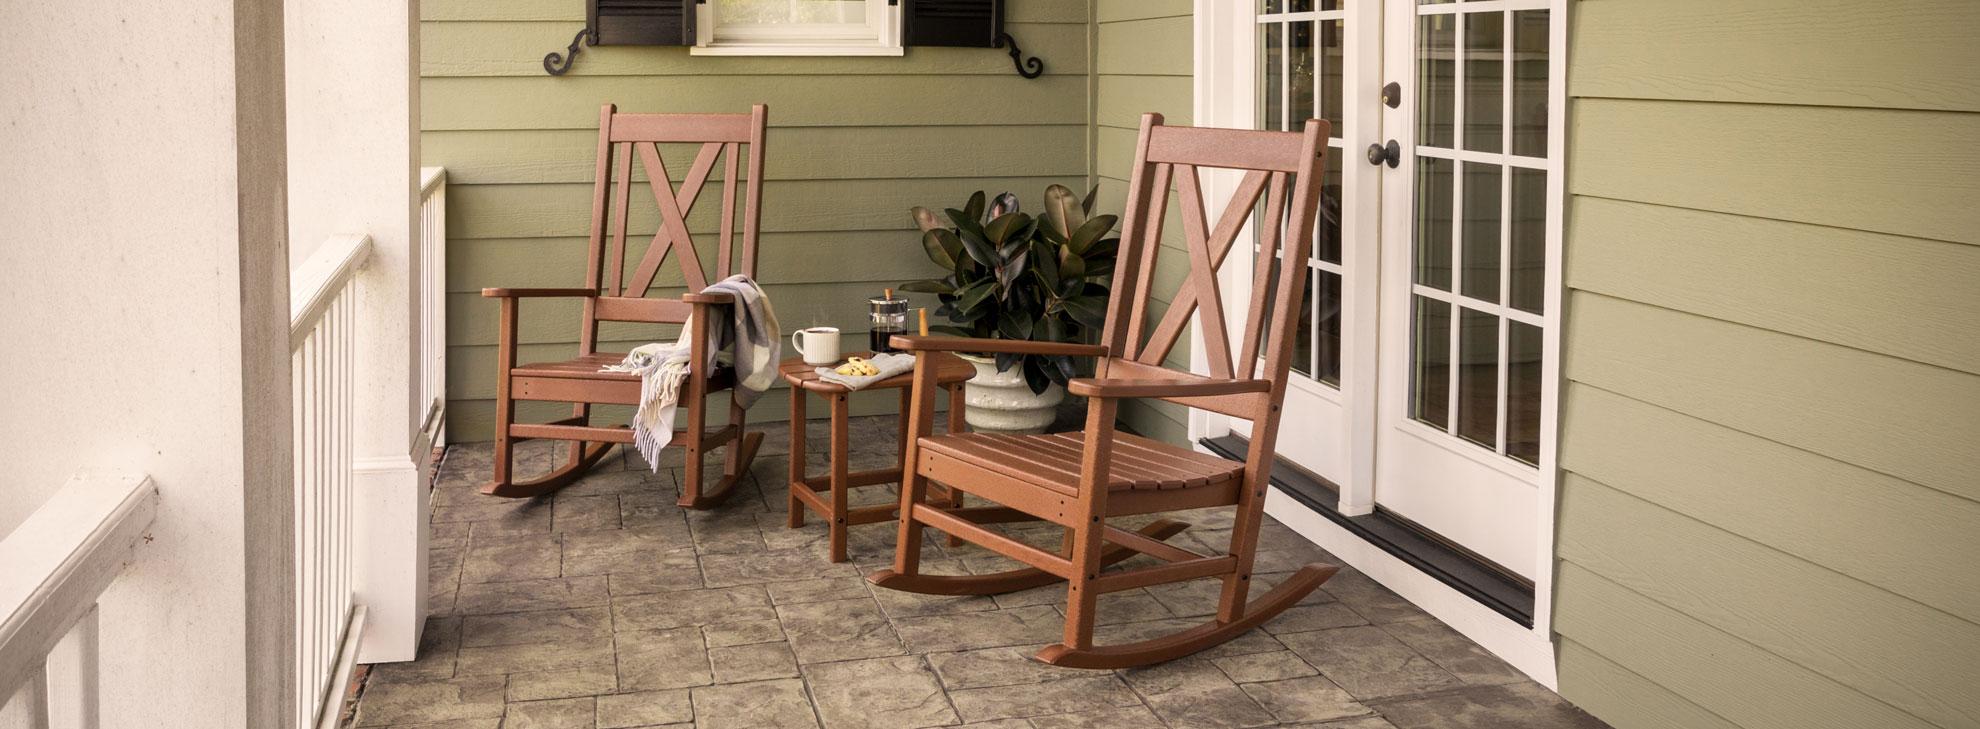 Porch Sets Under $1000